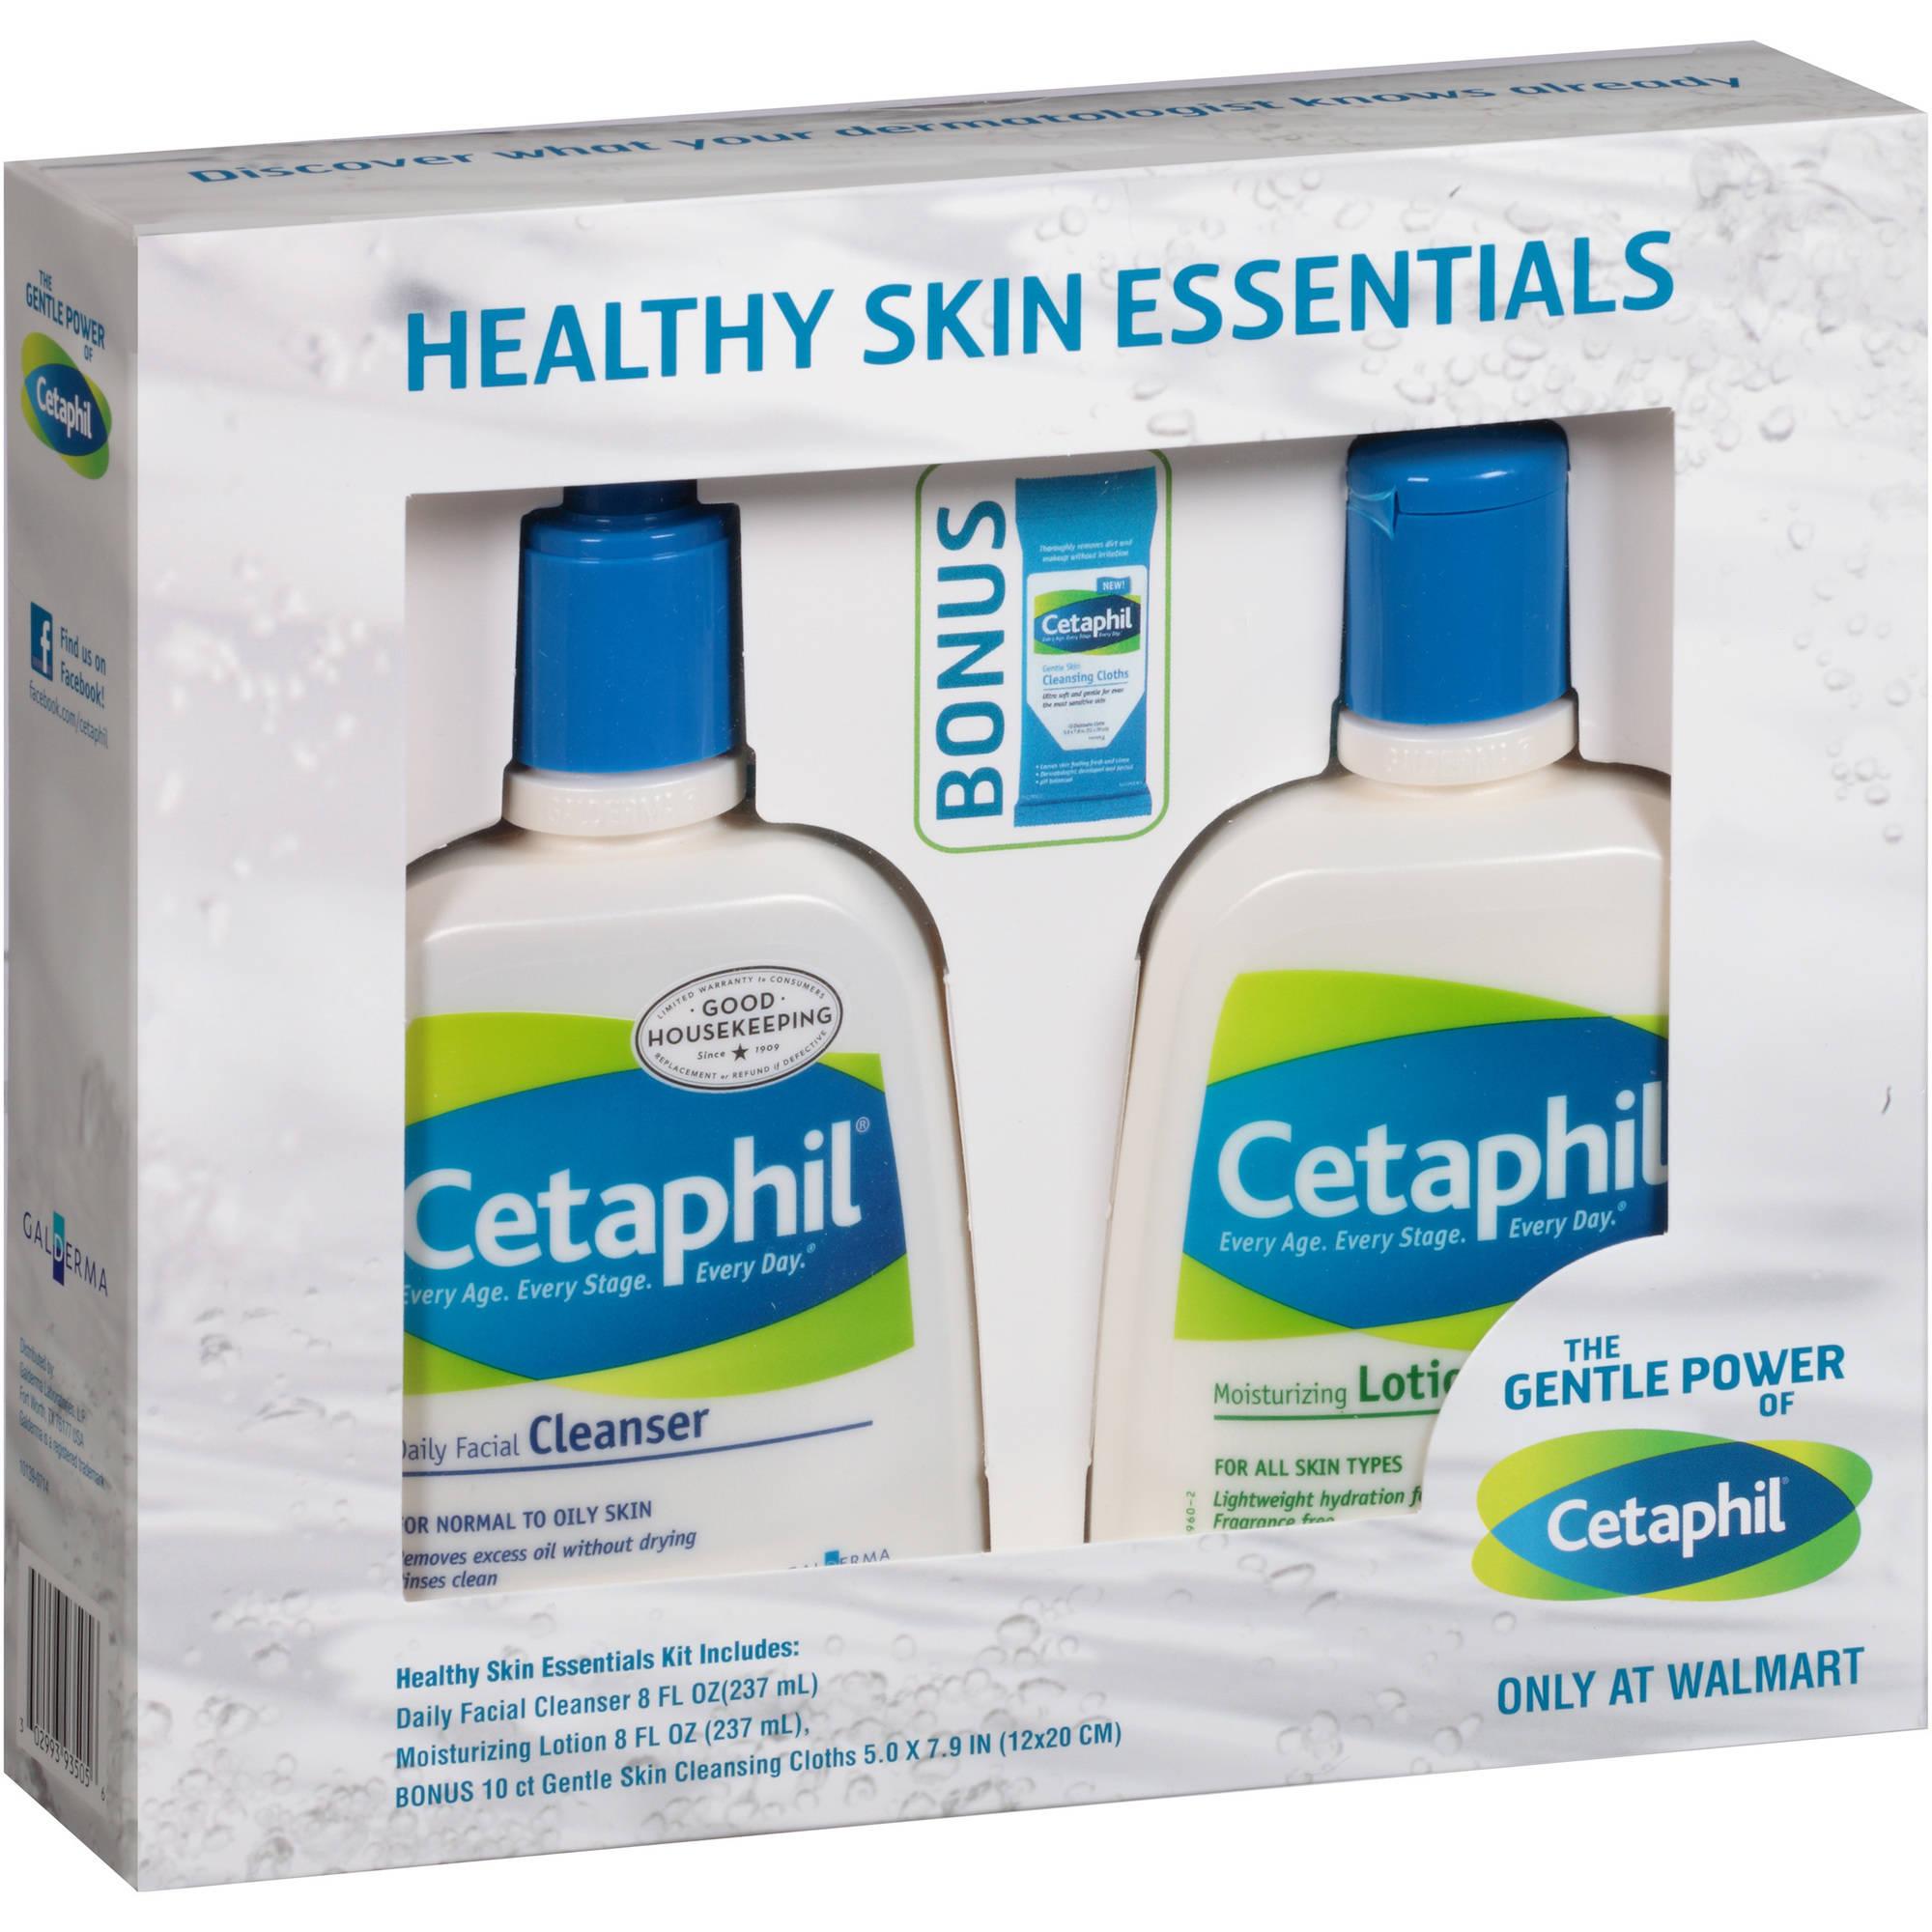 Galderma Laboratories, L.P. Cetaphil Healthy Skin Essentials Kit, 3 pc